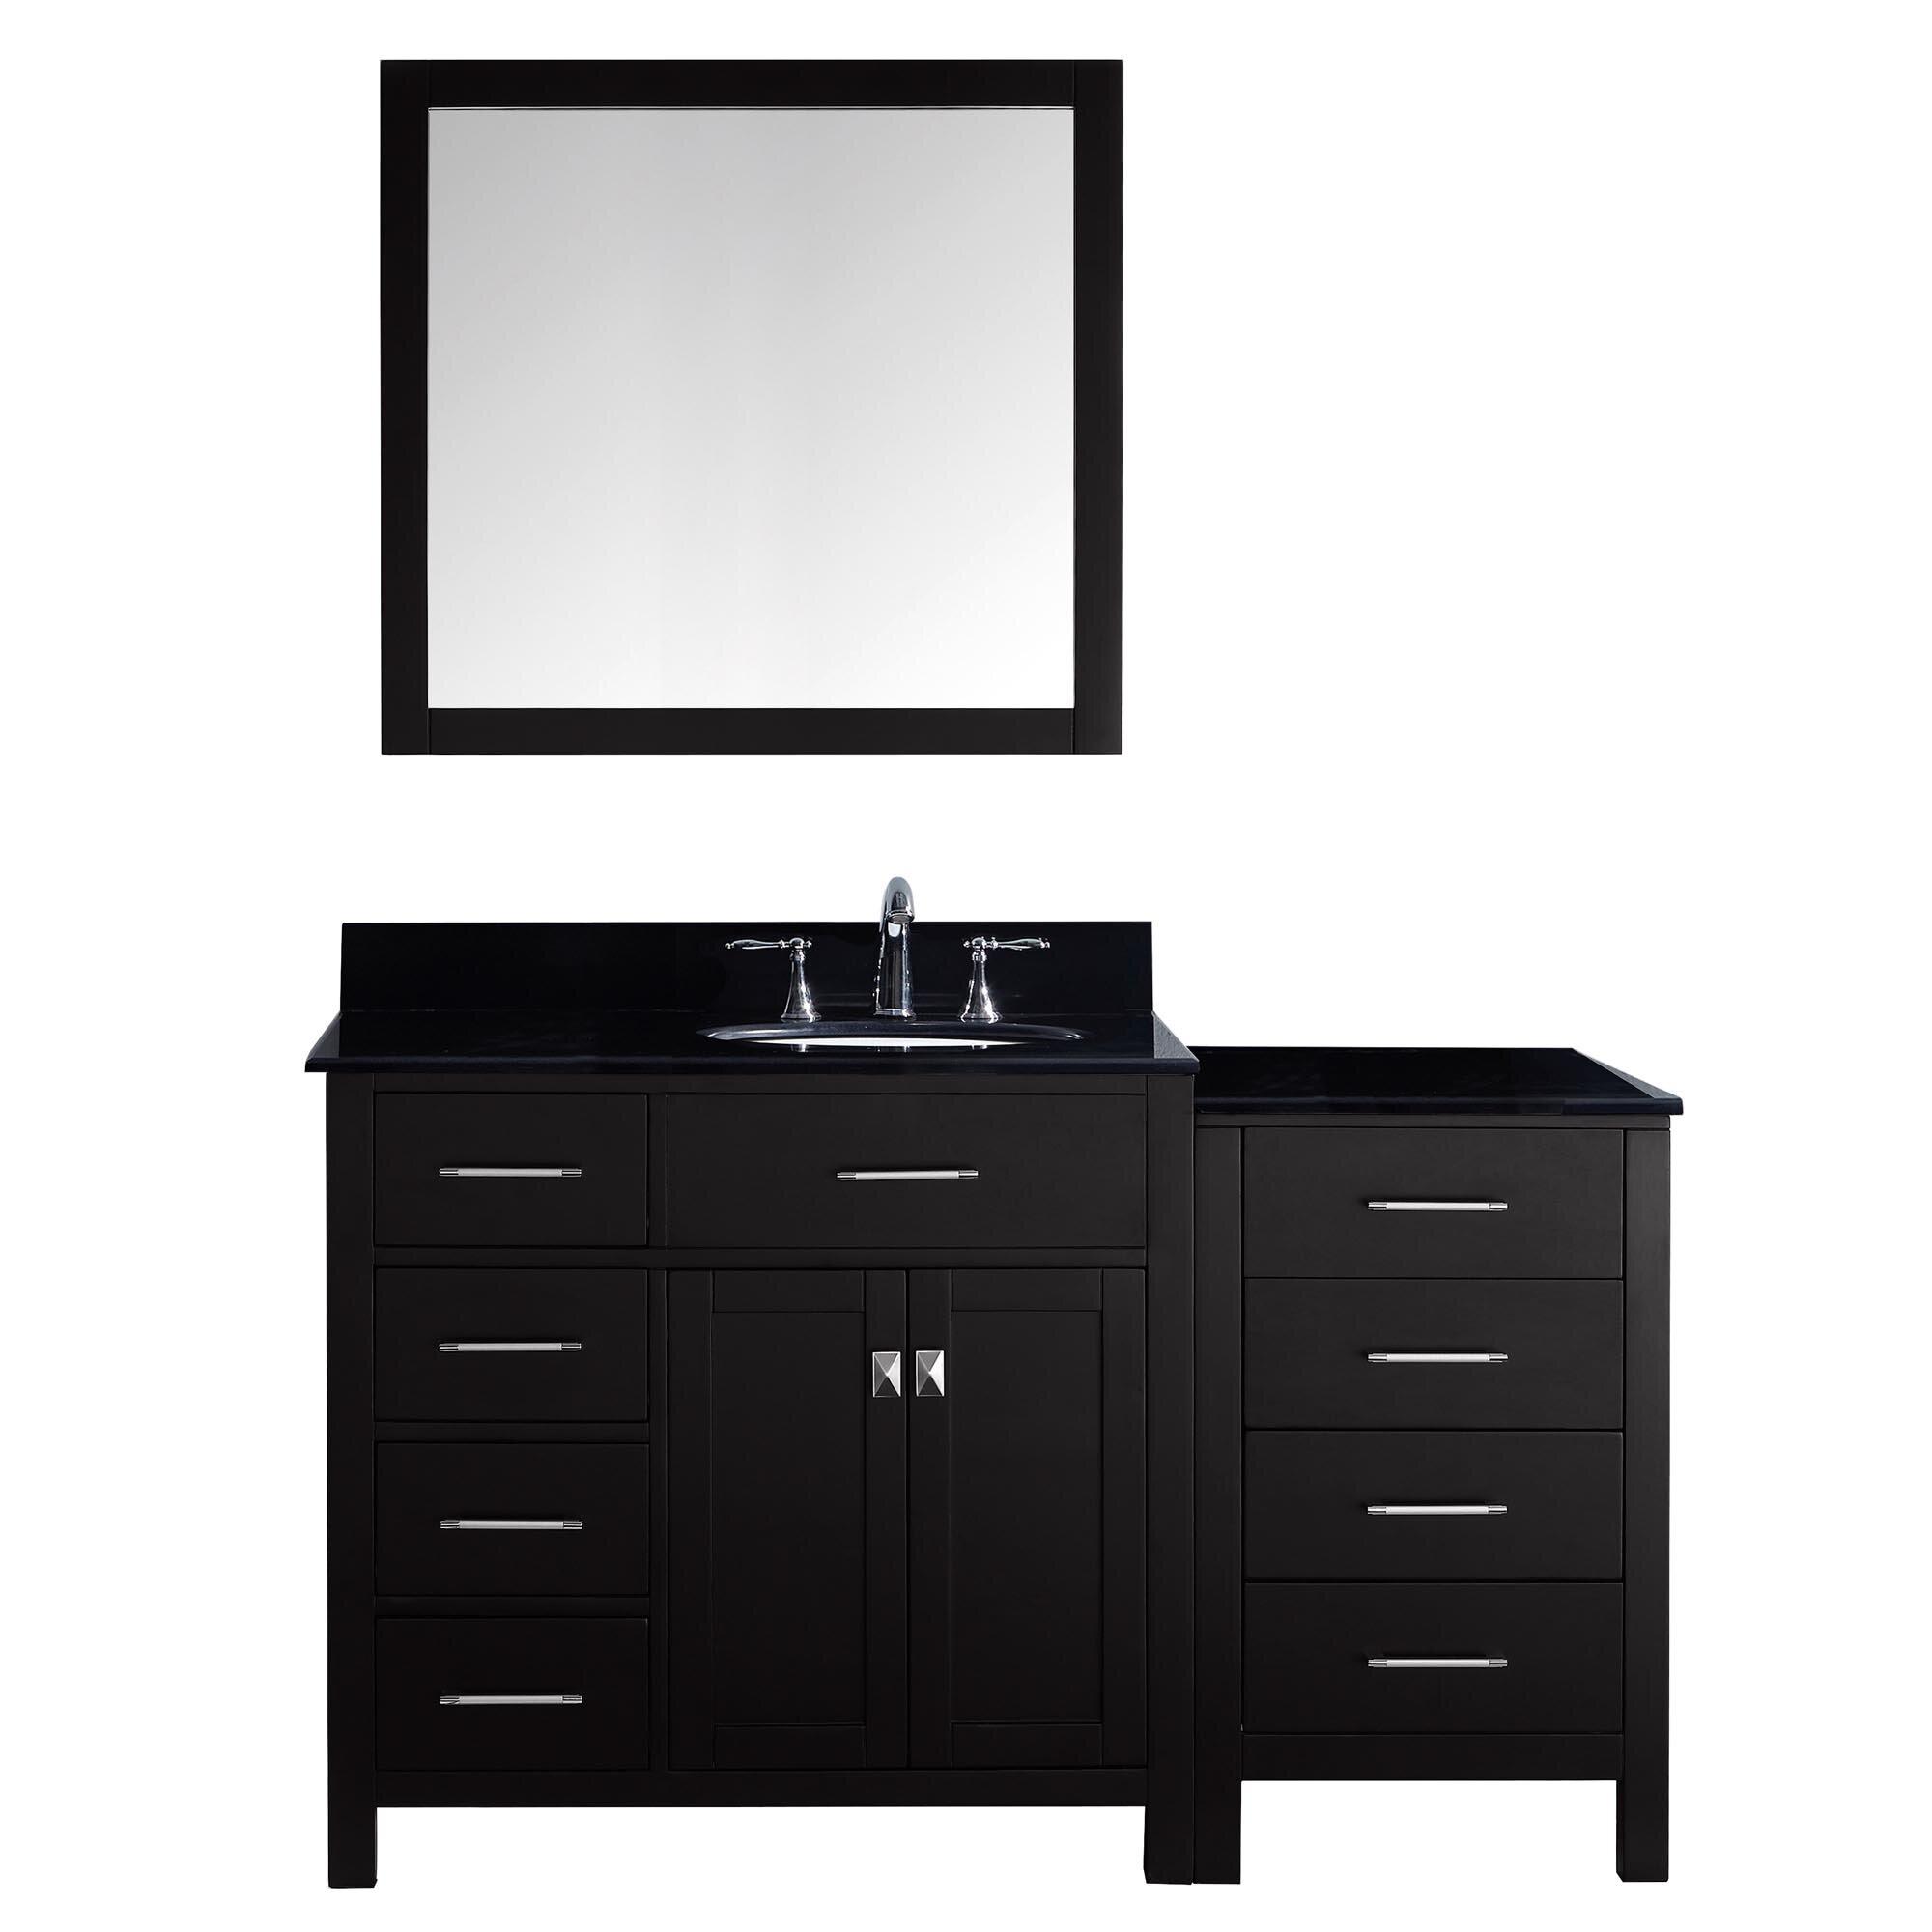 "Black Bathroom Vanity Set: Virtu Caroline Parkway 57"" Single Bathroom Vanity Set With"